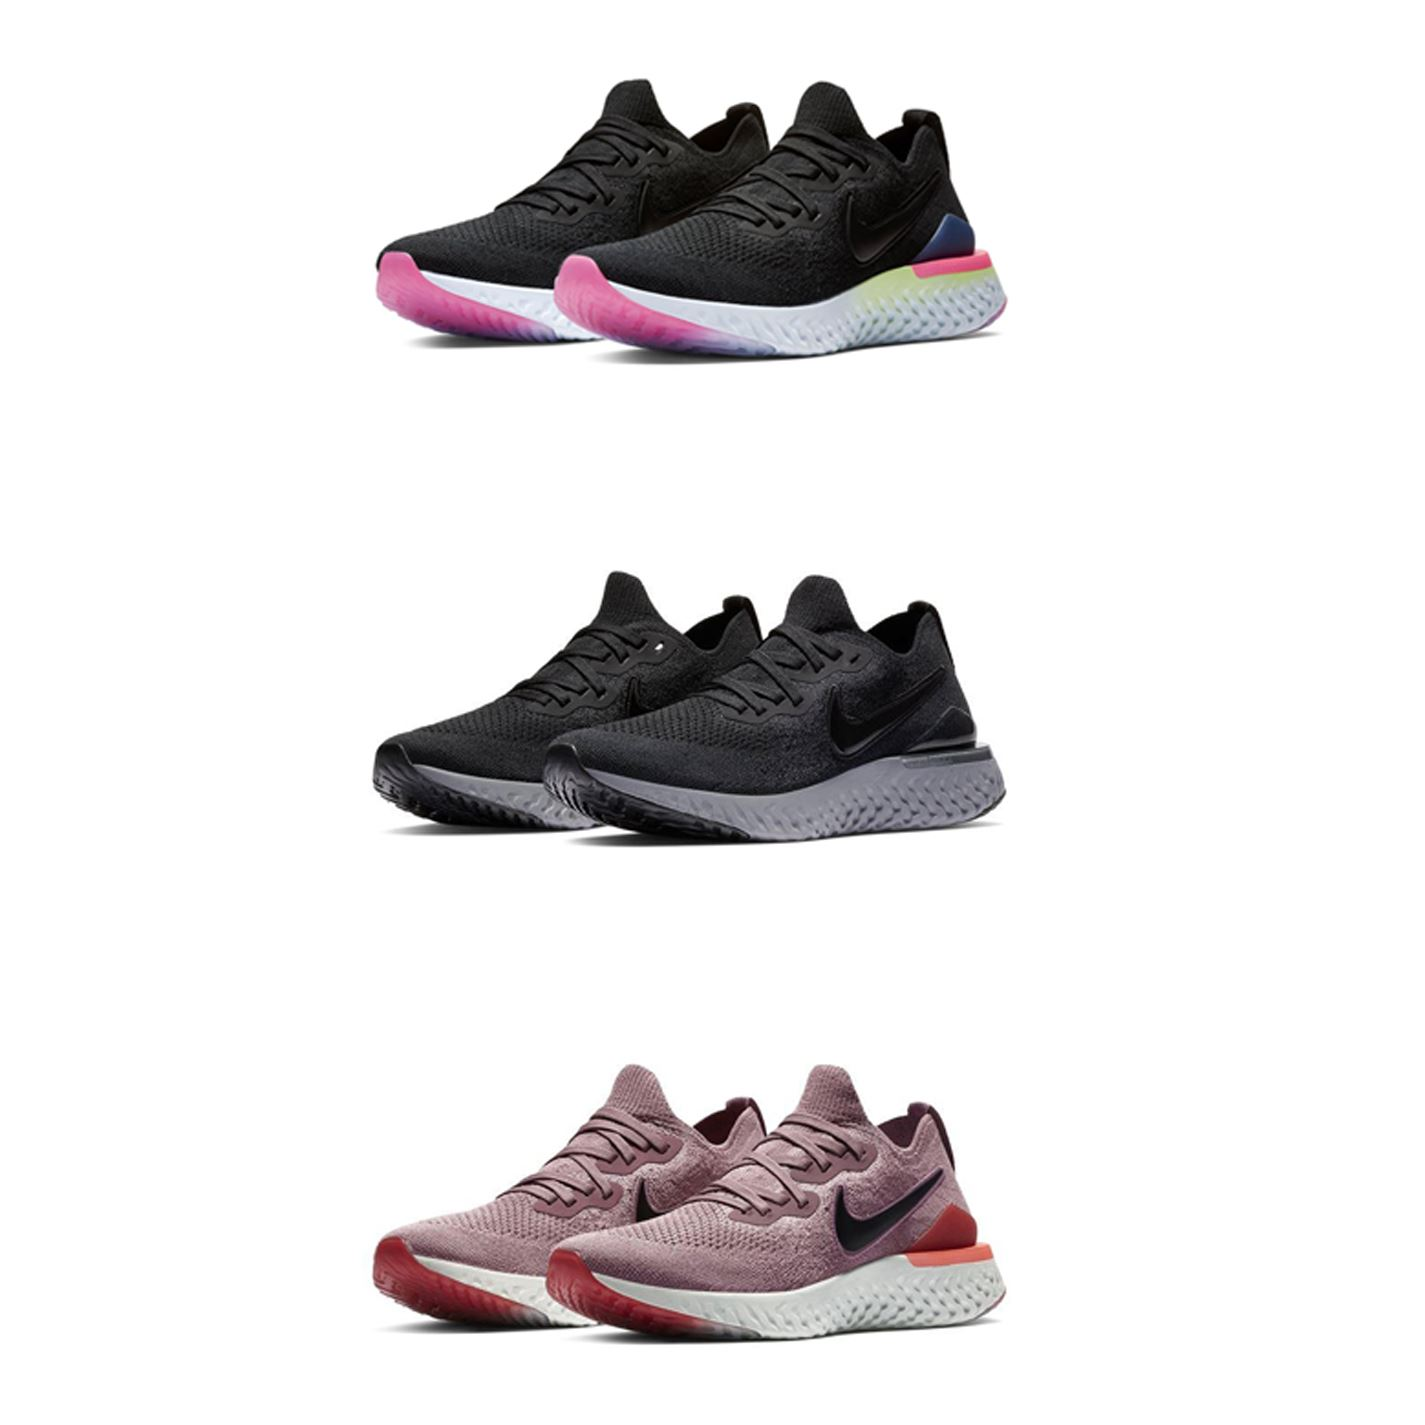 Detalles de Nike Epic React Flyknit 2 Zapatillas Running Mujer Trote Fitness